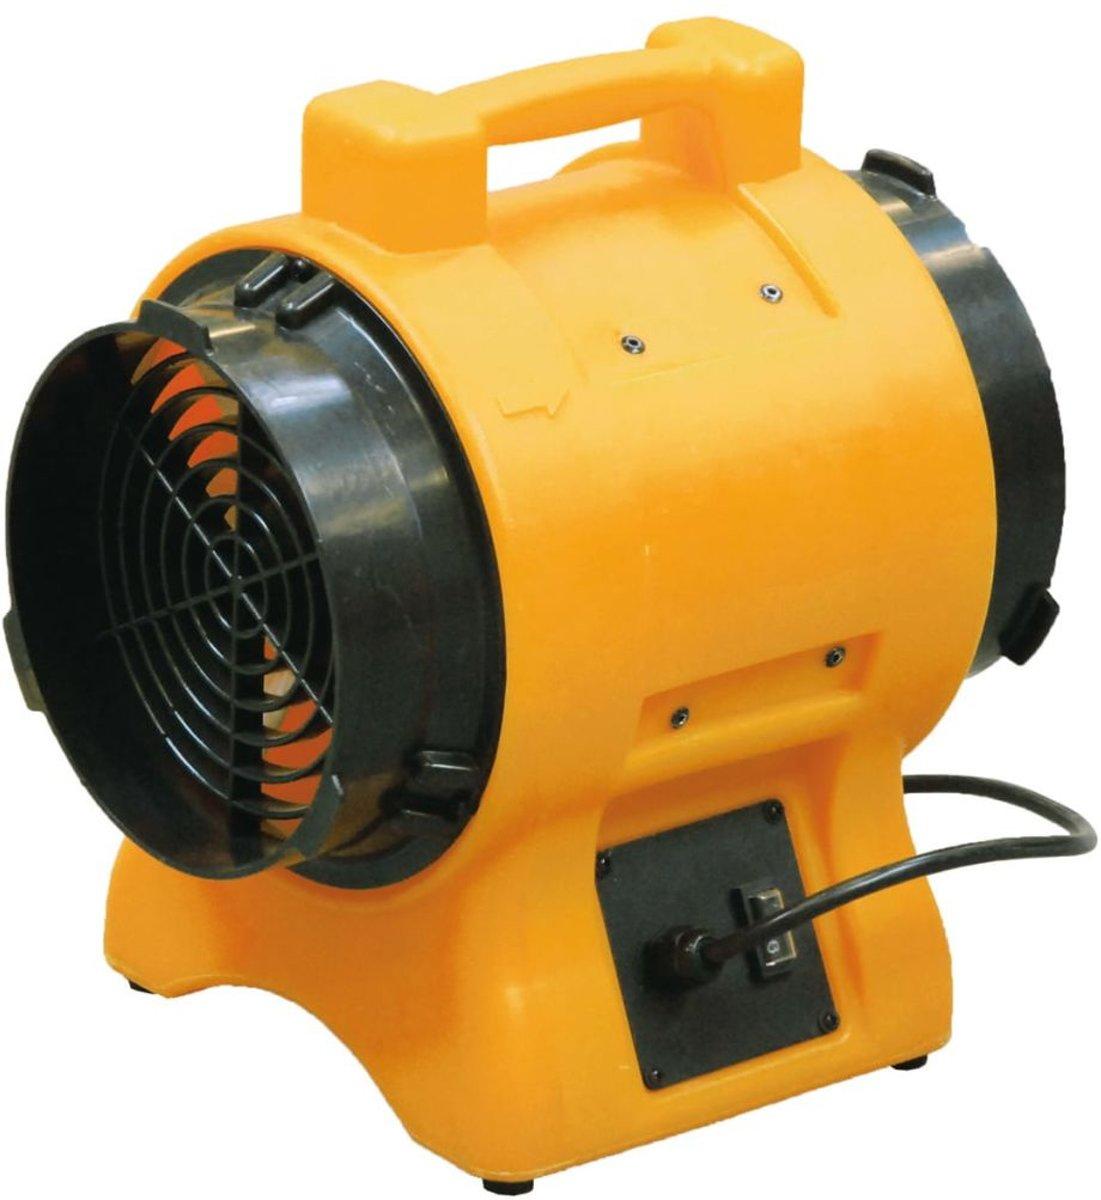 Ventilator, type Master BL 6800 kopen